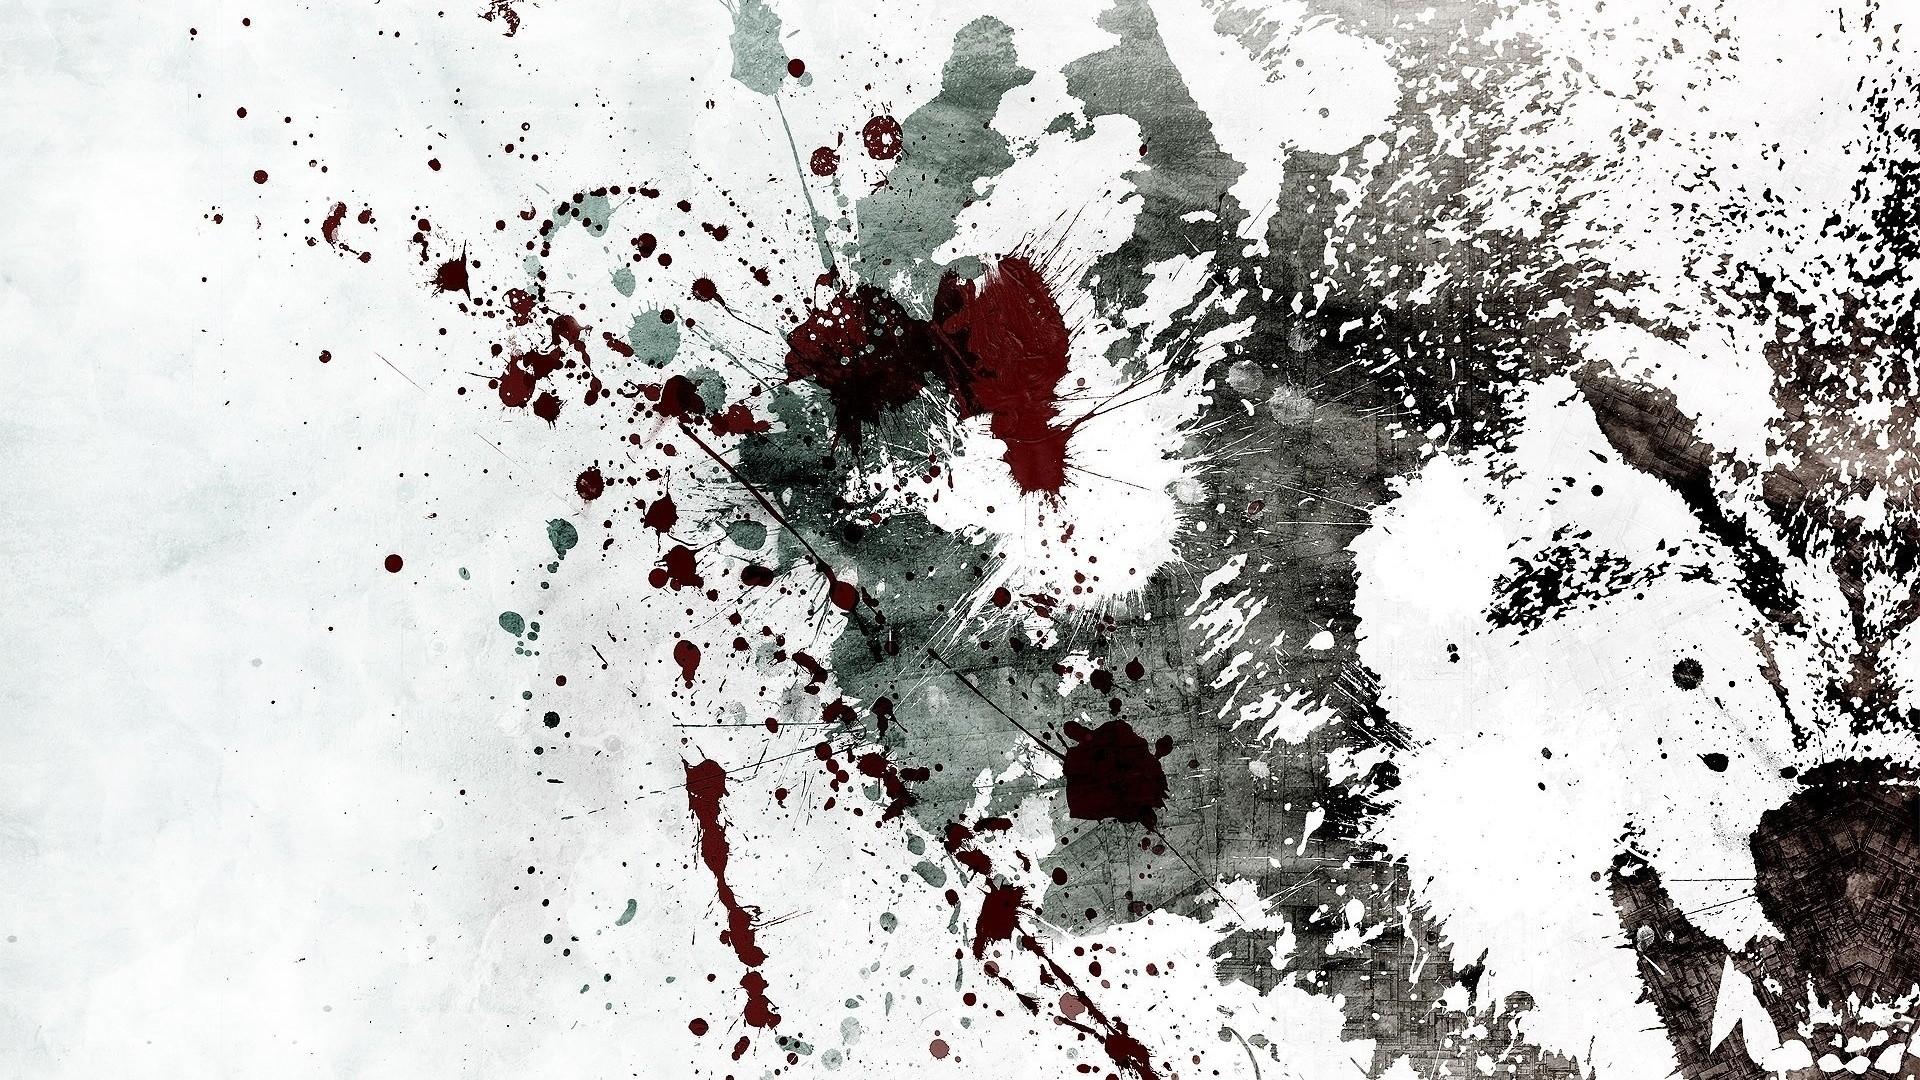 Abstract Wolf Wallpaper WallpaperSafari